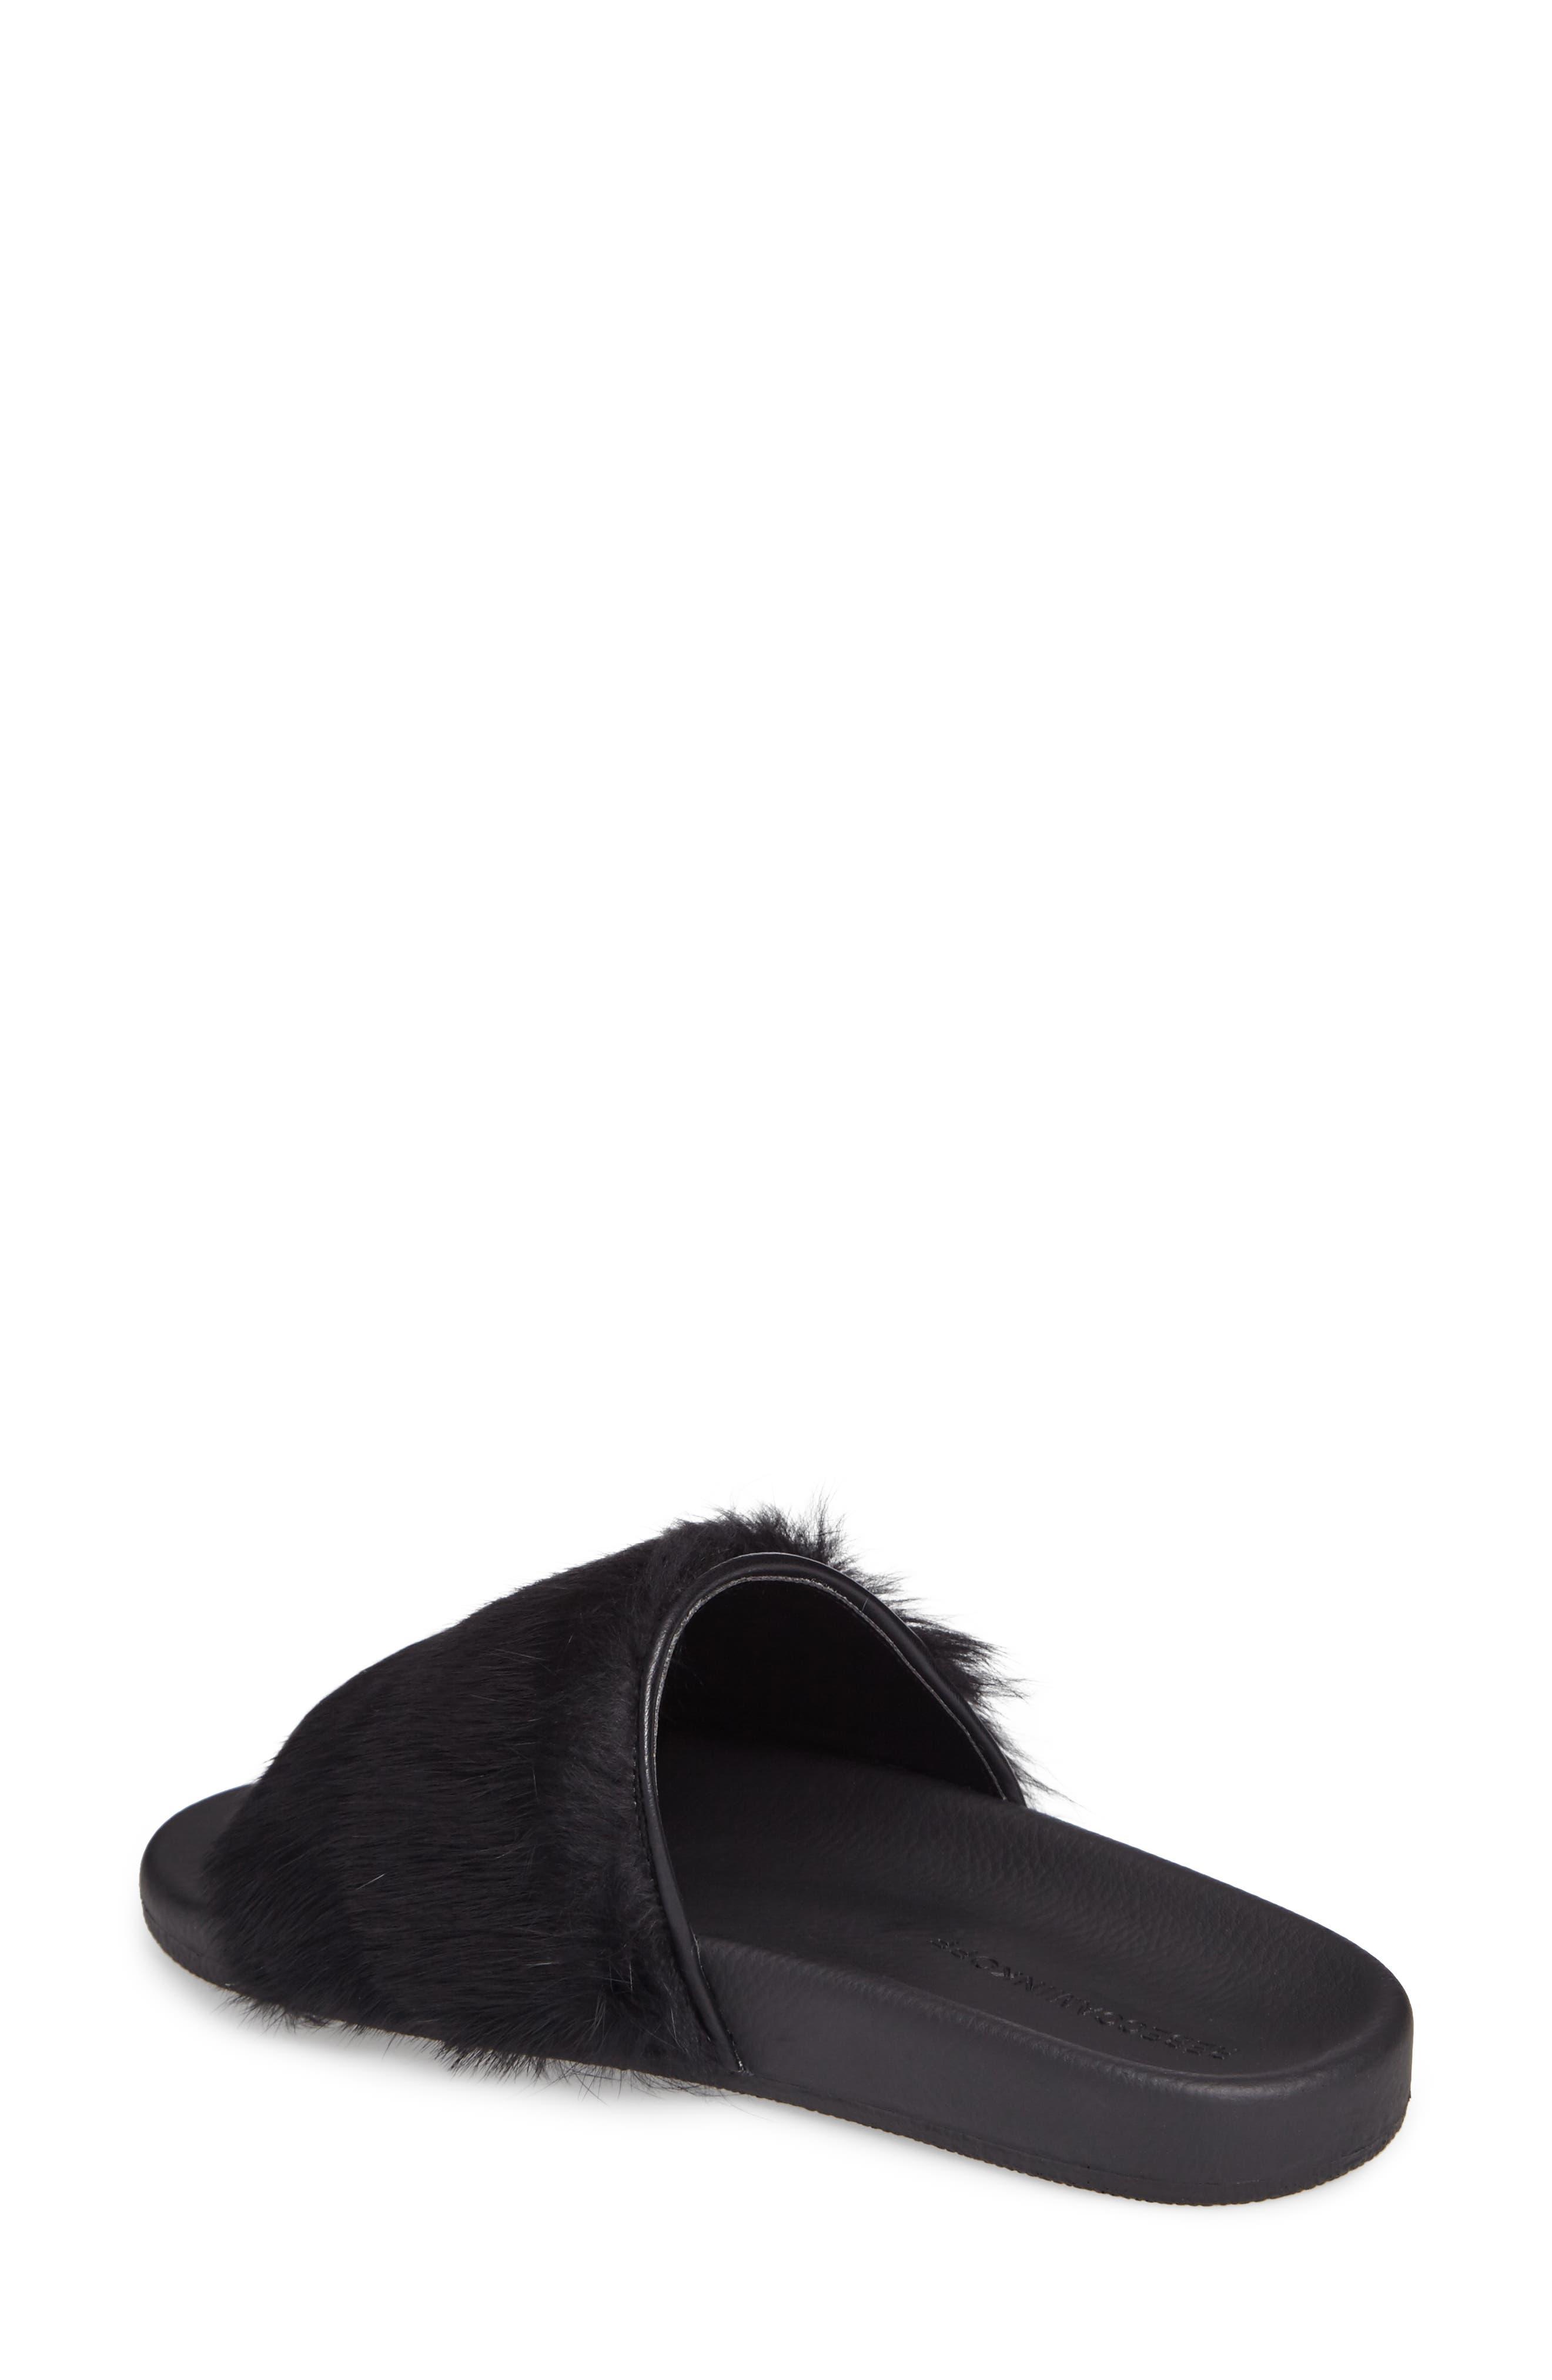 Sammi Genuine Fur Slide Sandal,                             Alternate thumbnail 2, color,                             001